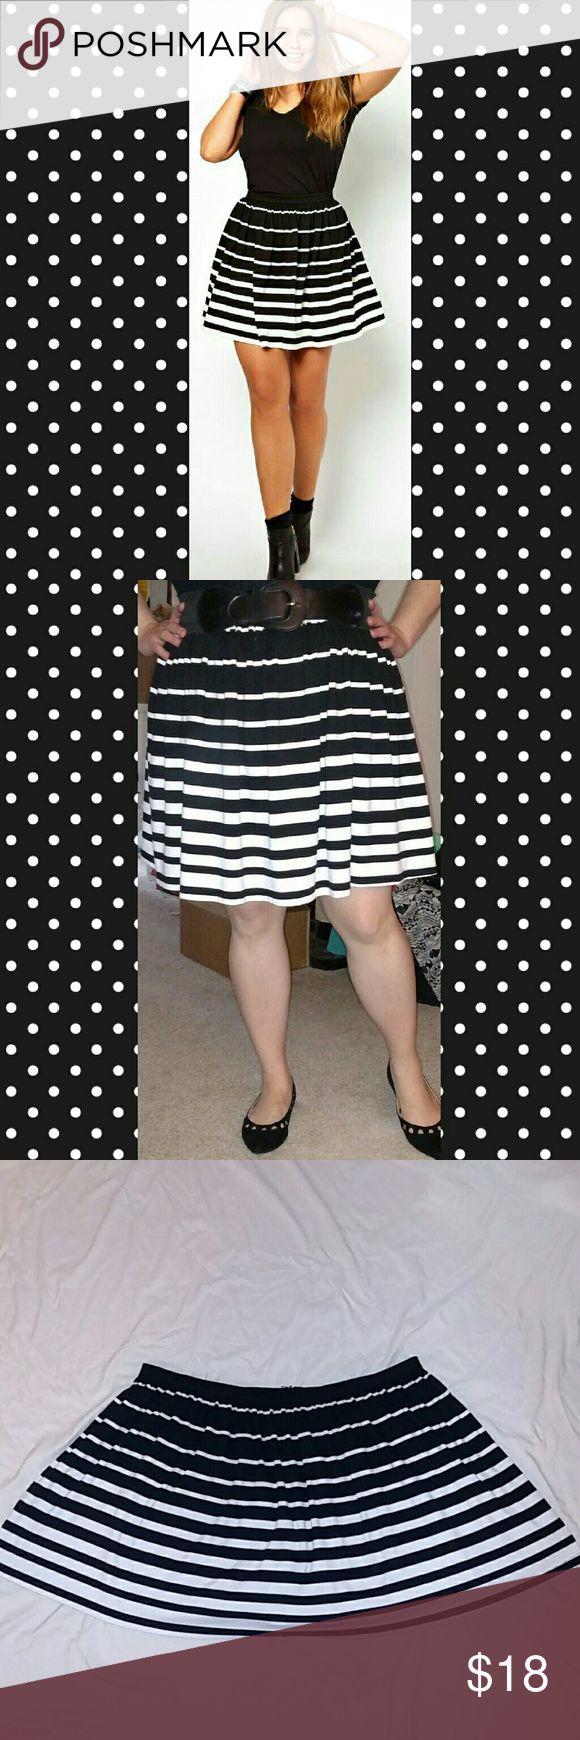 Asos Curve striped circle skirt Black and white striped ASOS curve skirt. Zipper closure, missing hook and eye closure. ASOS Curve Skirts Circle & Skater